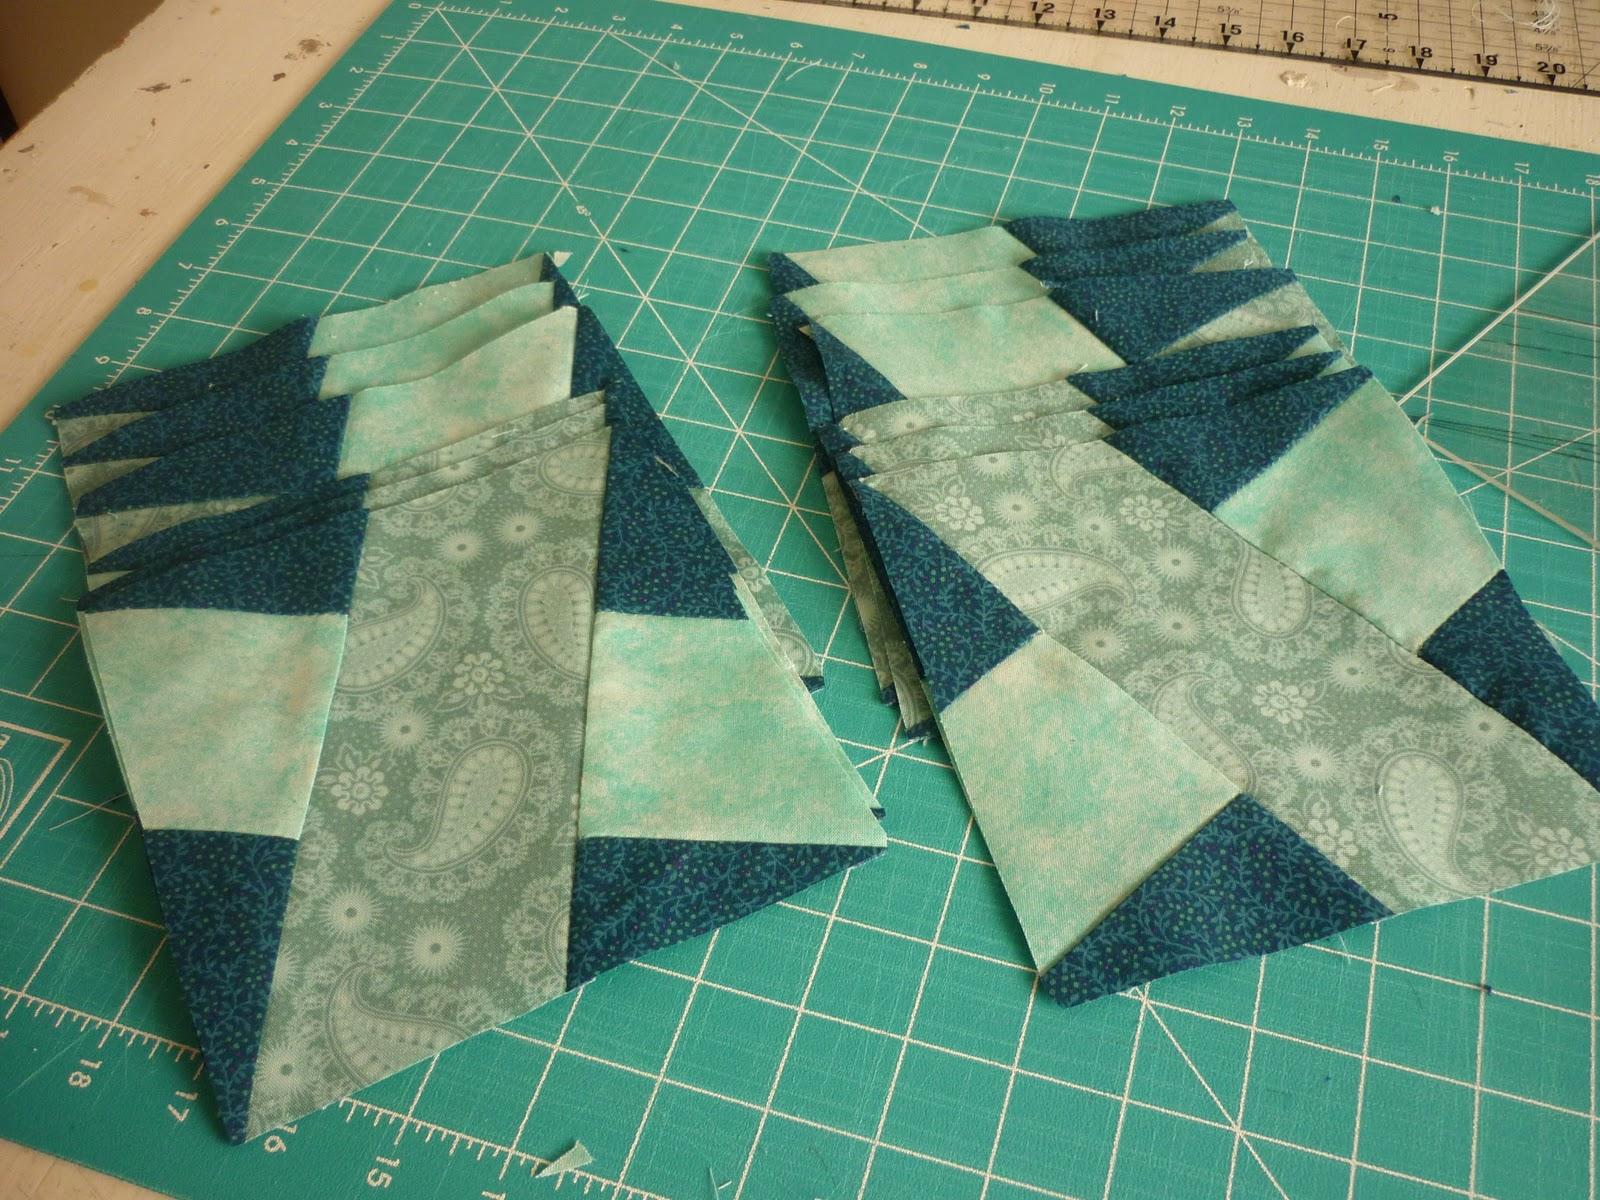 Casita del patchwork camino de mesa x block - Camino mesa patchwork ...